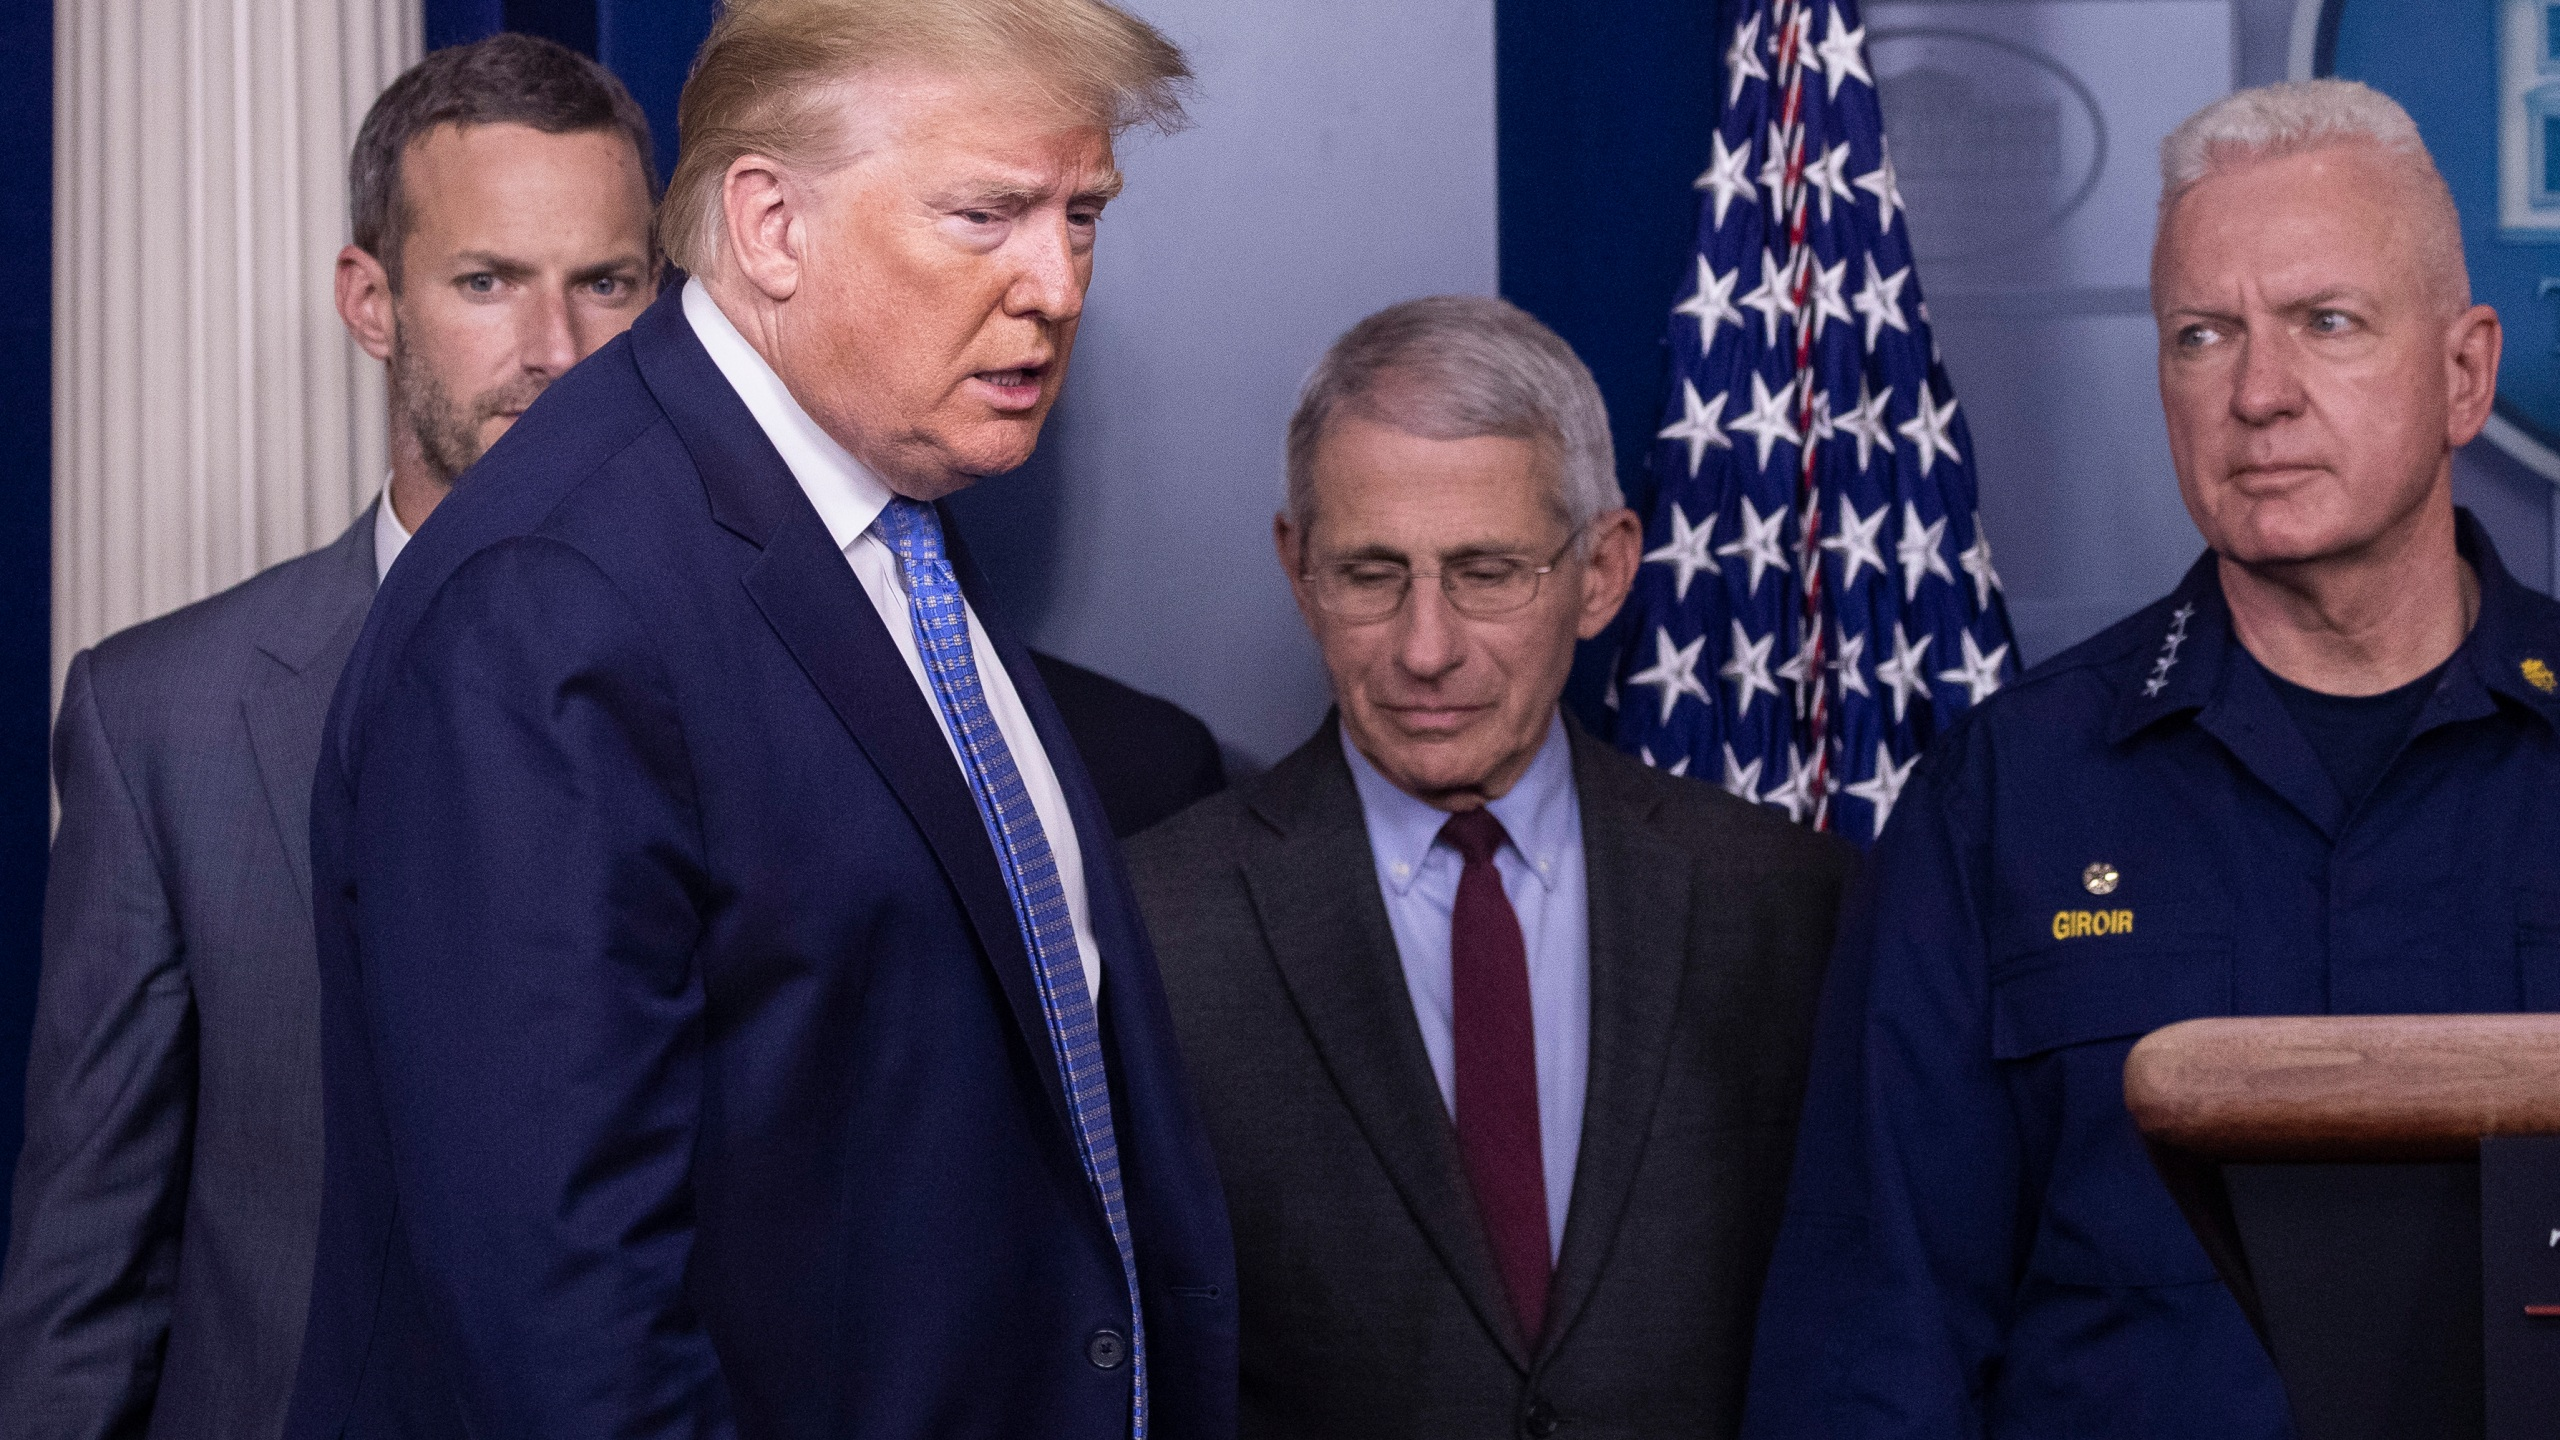 Donald Trump, Anthony Fauci, Brett Giroir